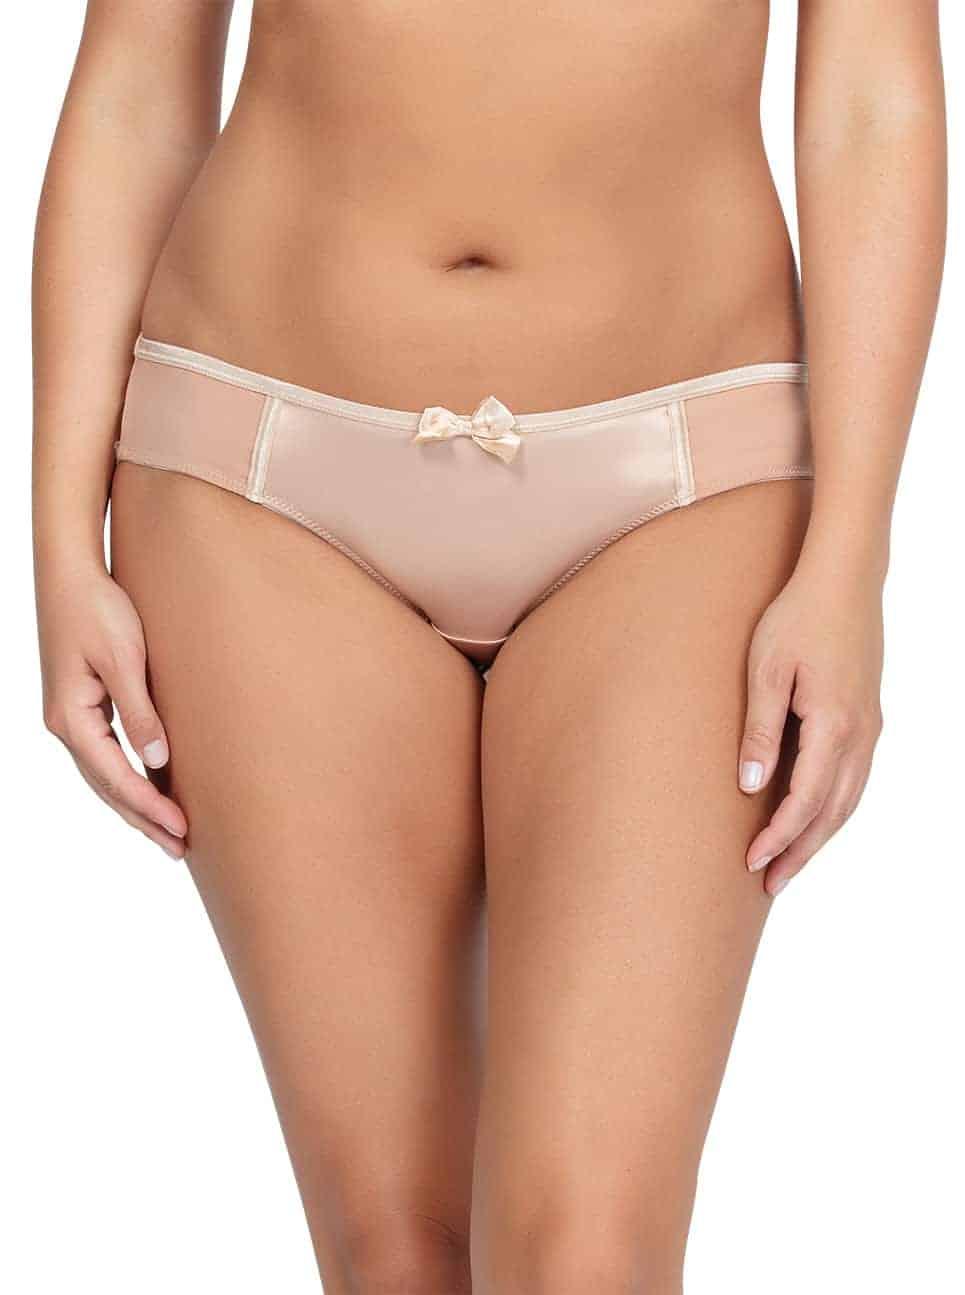 Charlotte Bikini6905 TrueNude Front2 - Charlotte Bikini - True Nude - 6905